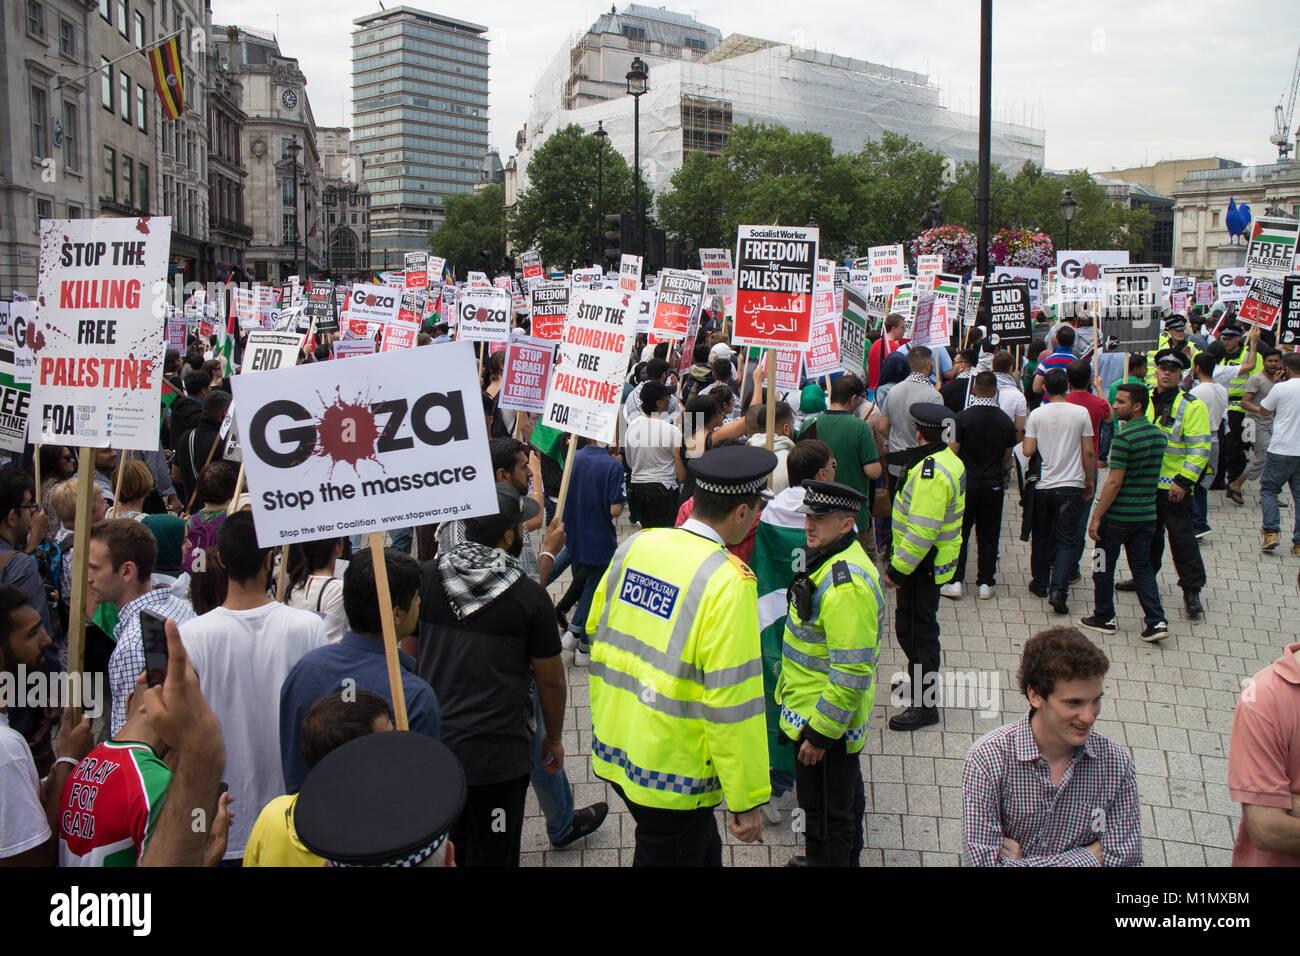 Gaza Demo - Free Palestine - Stock Image